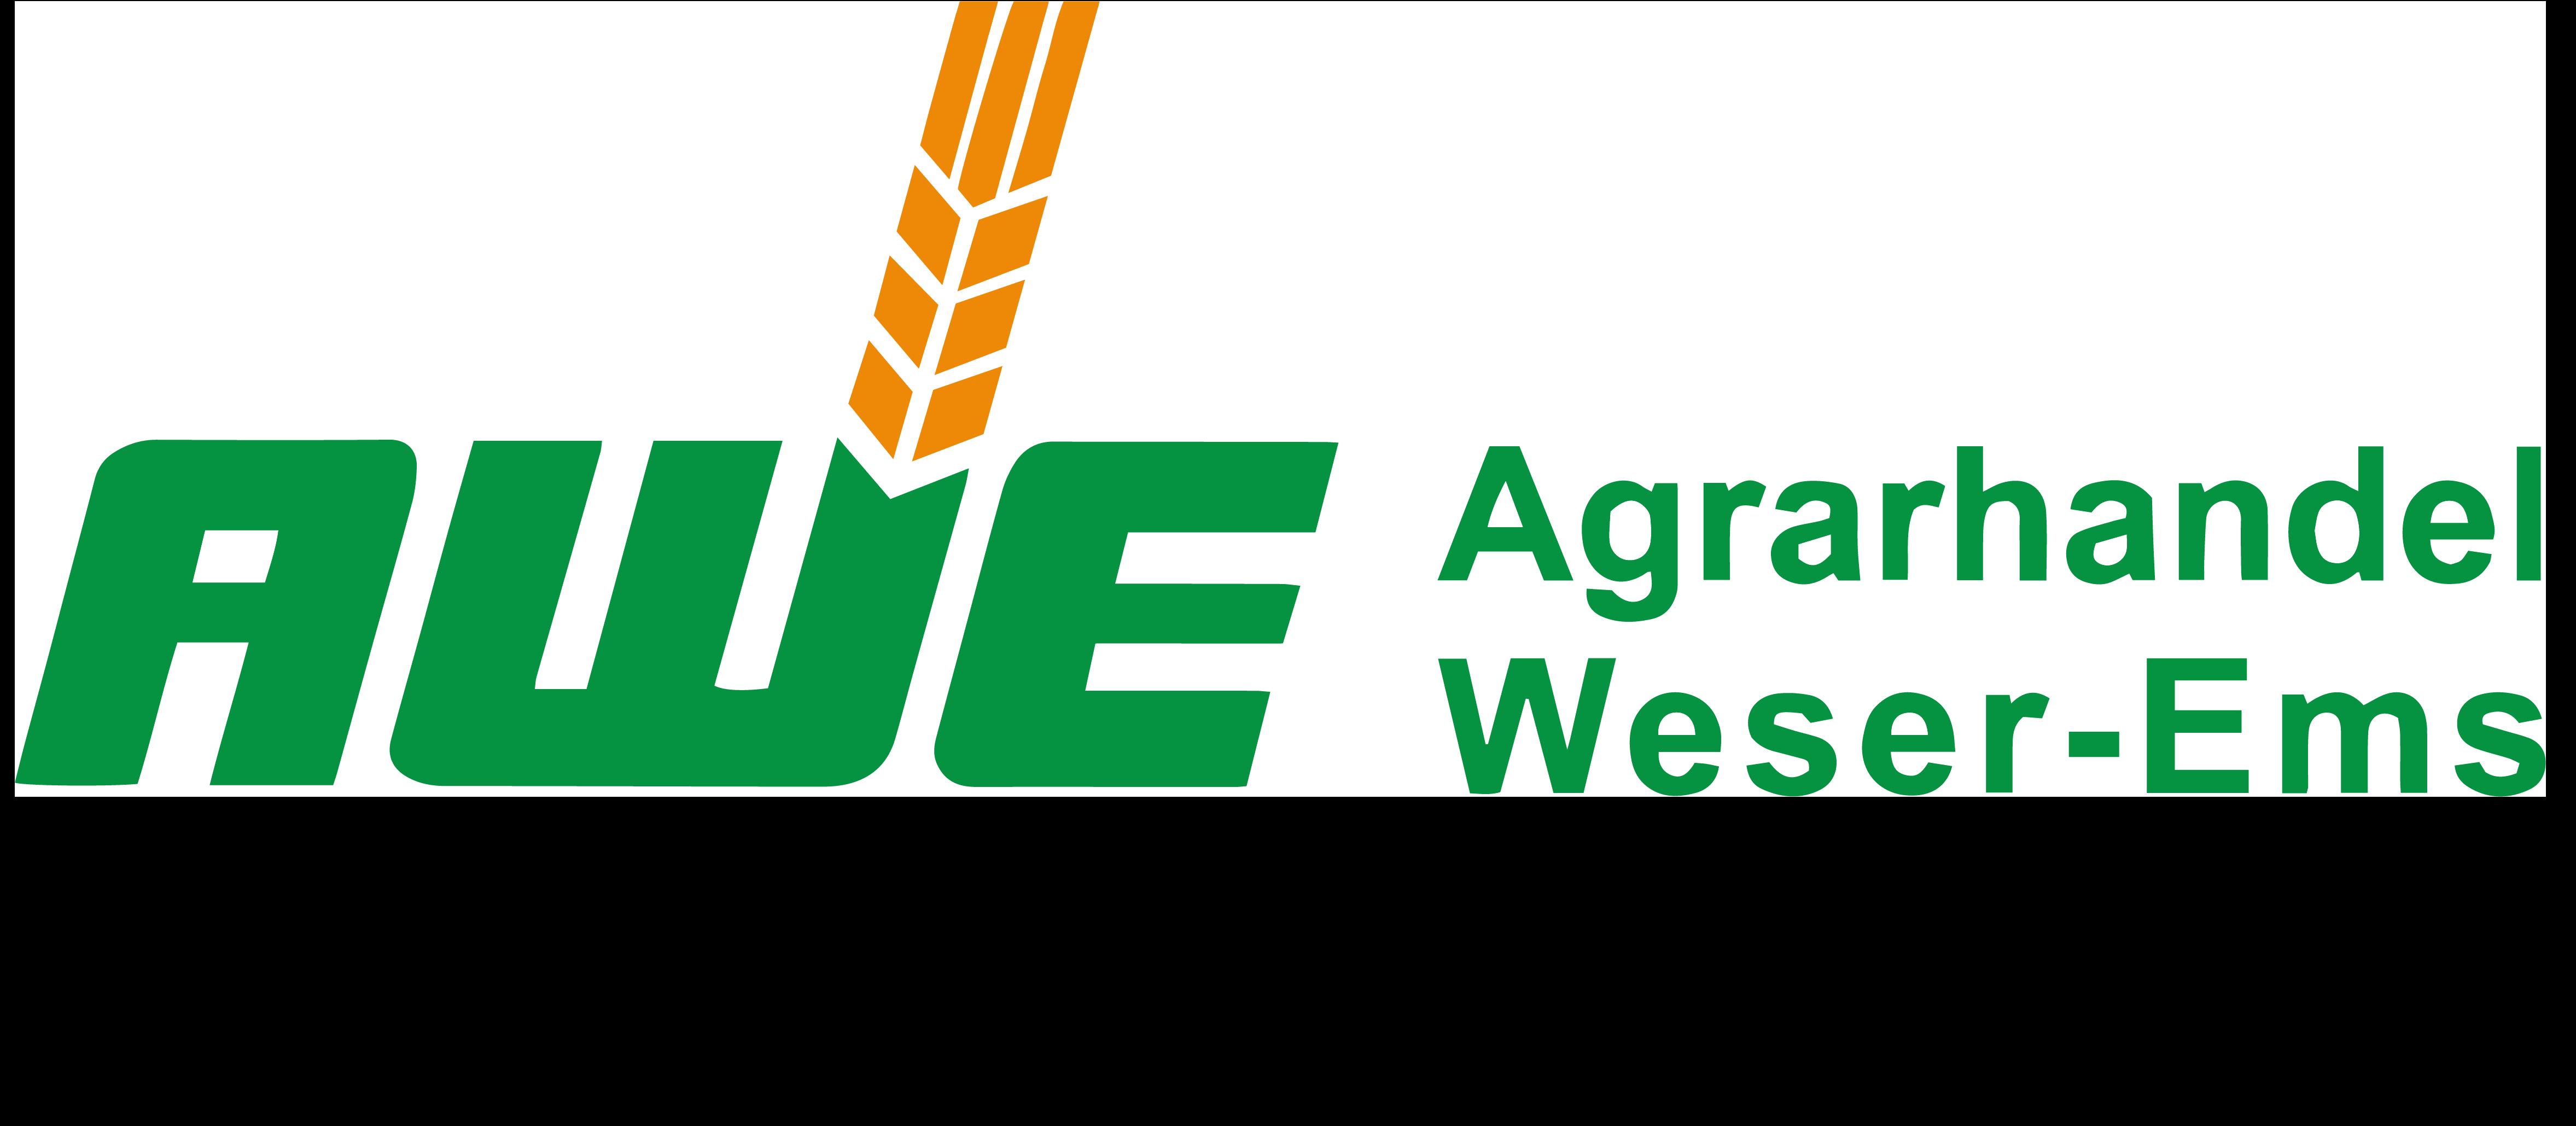 AWE-Agrarhandel Weser-Ems